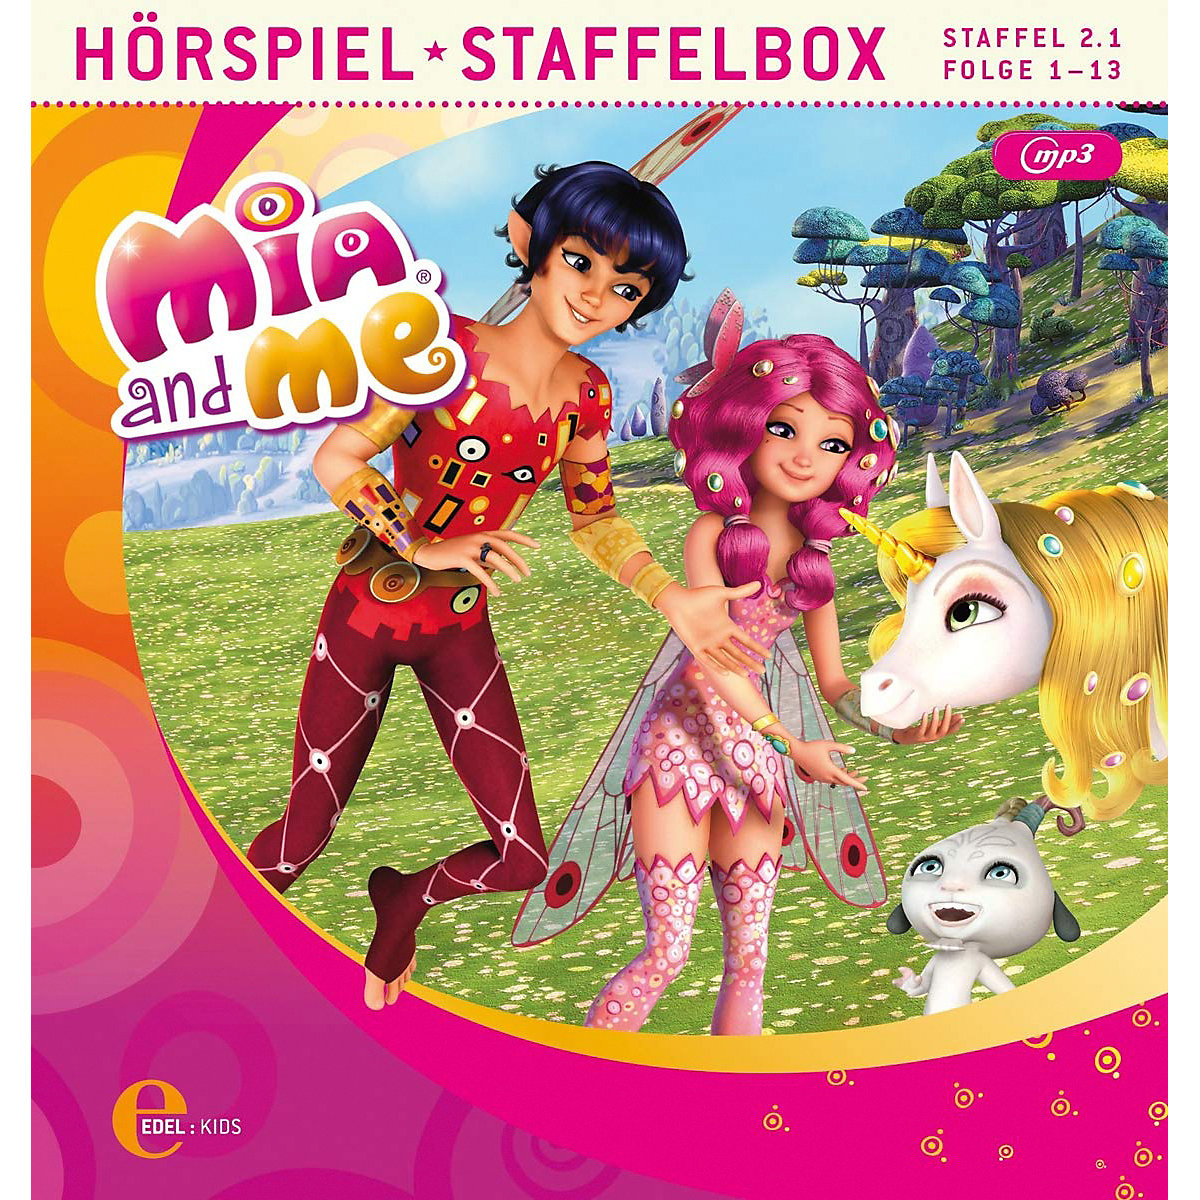 cd mia and me staffelbox 21 mp3cd miame  mytoys